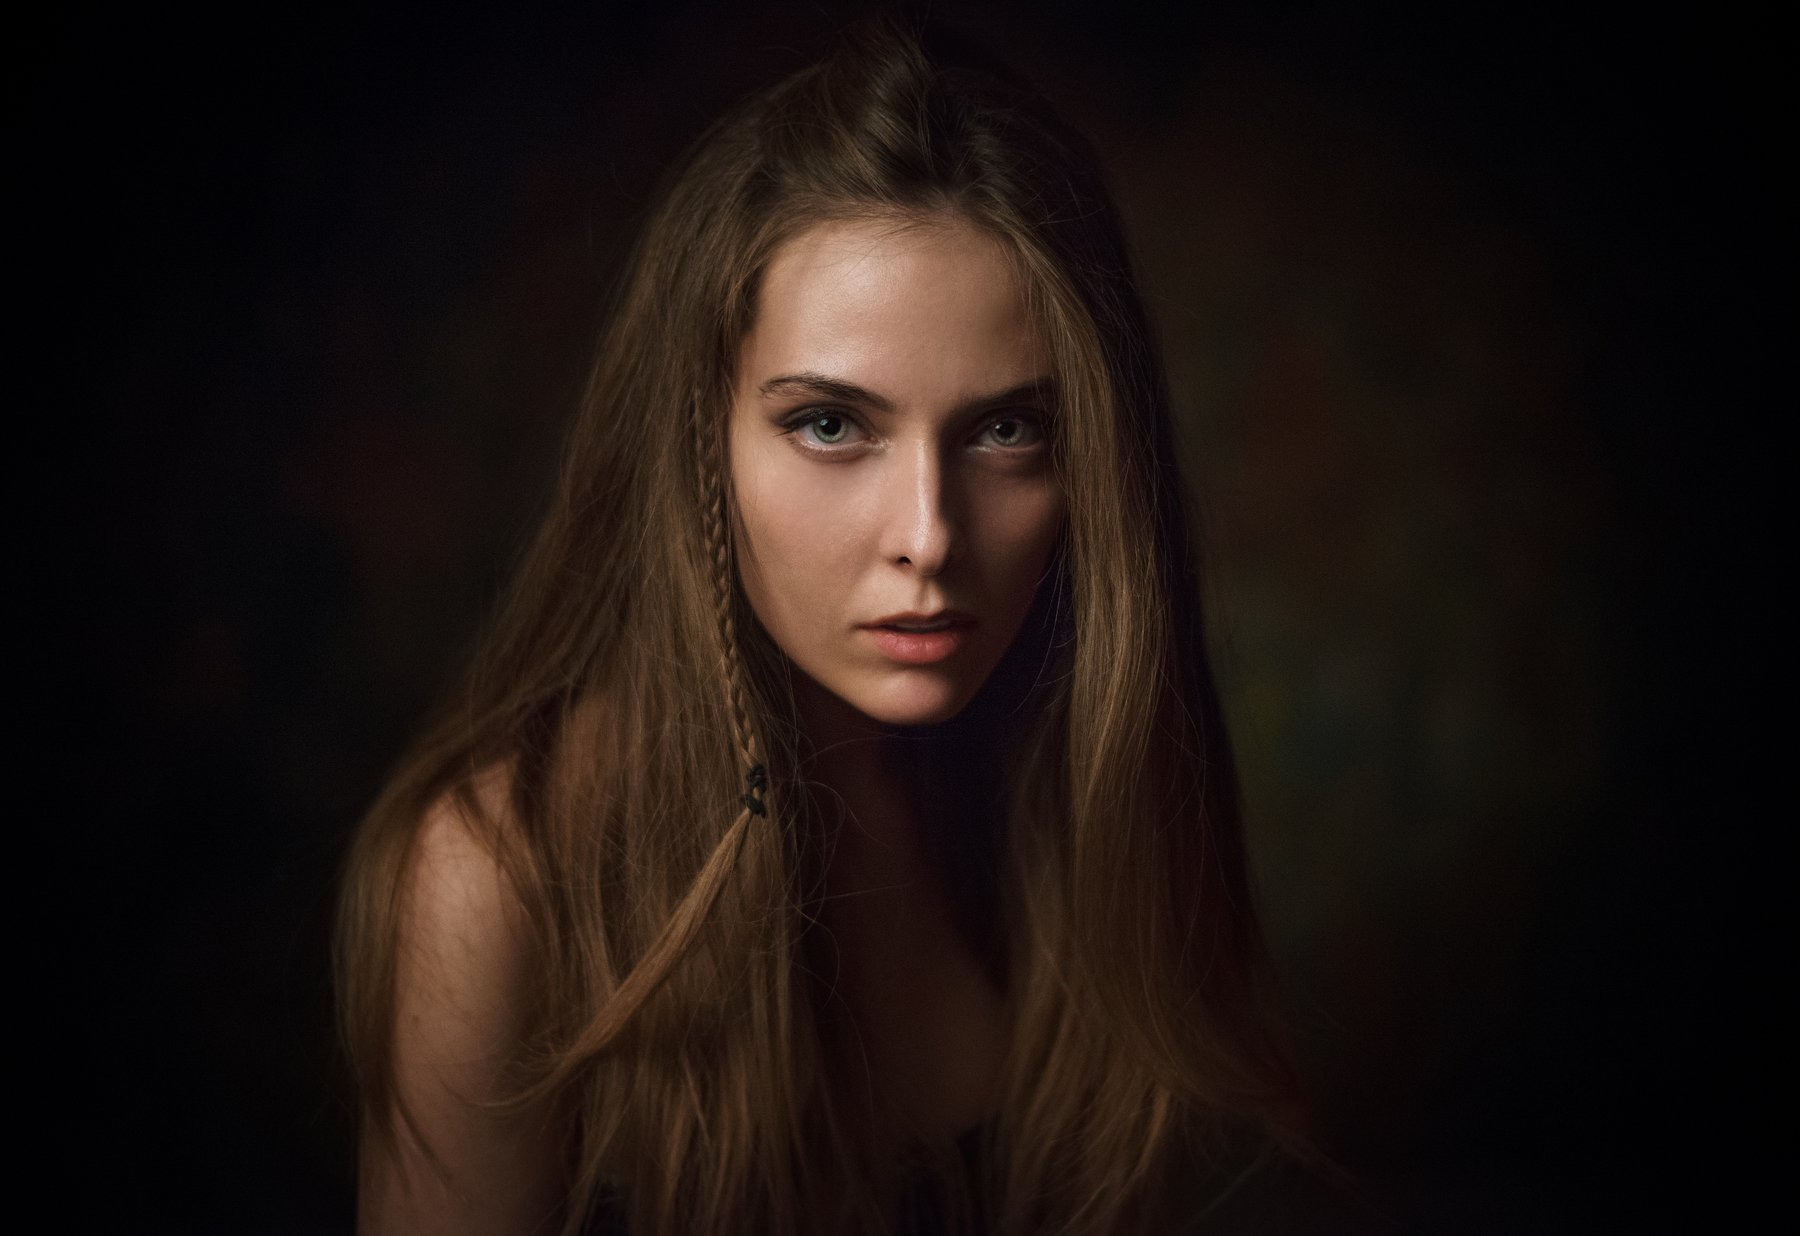 2016, beautiful, girl, portrait, portrait2016, девушка, портрет, Максим Максимов